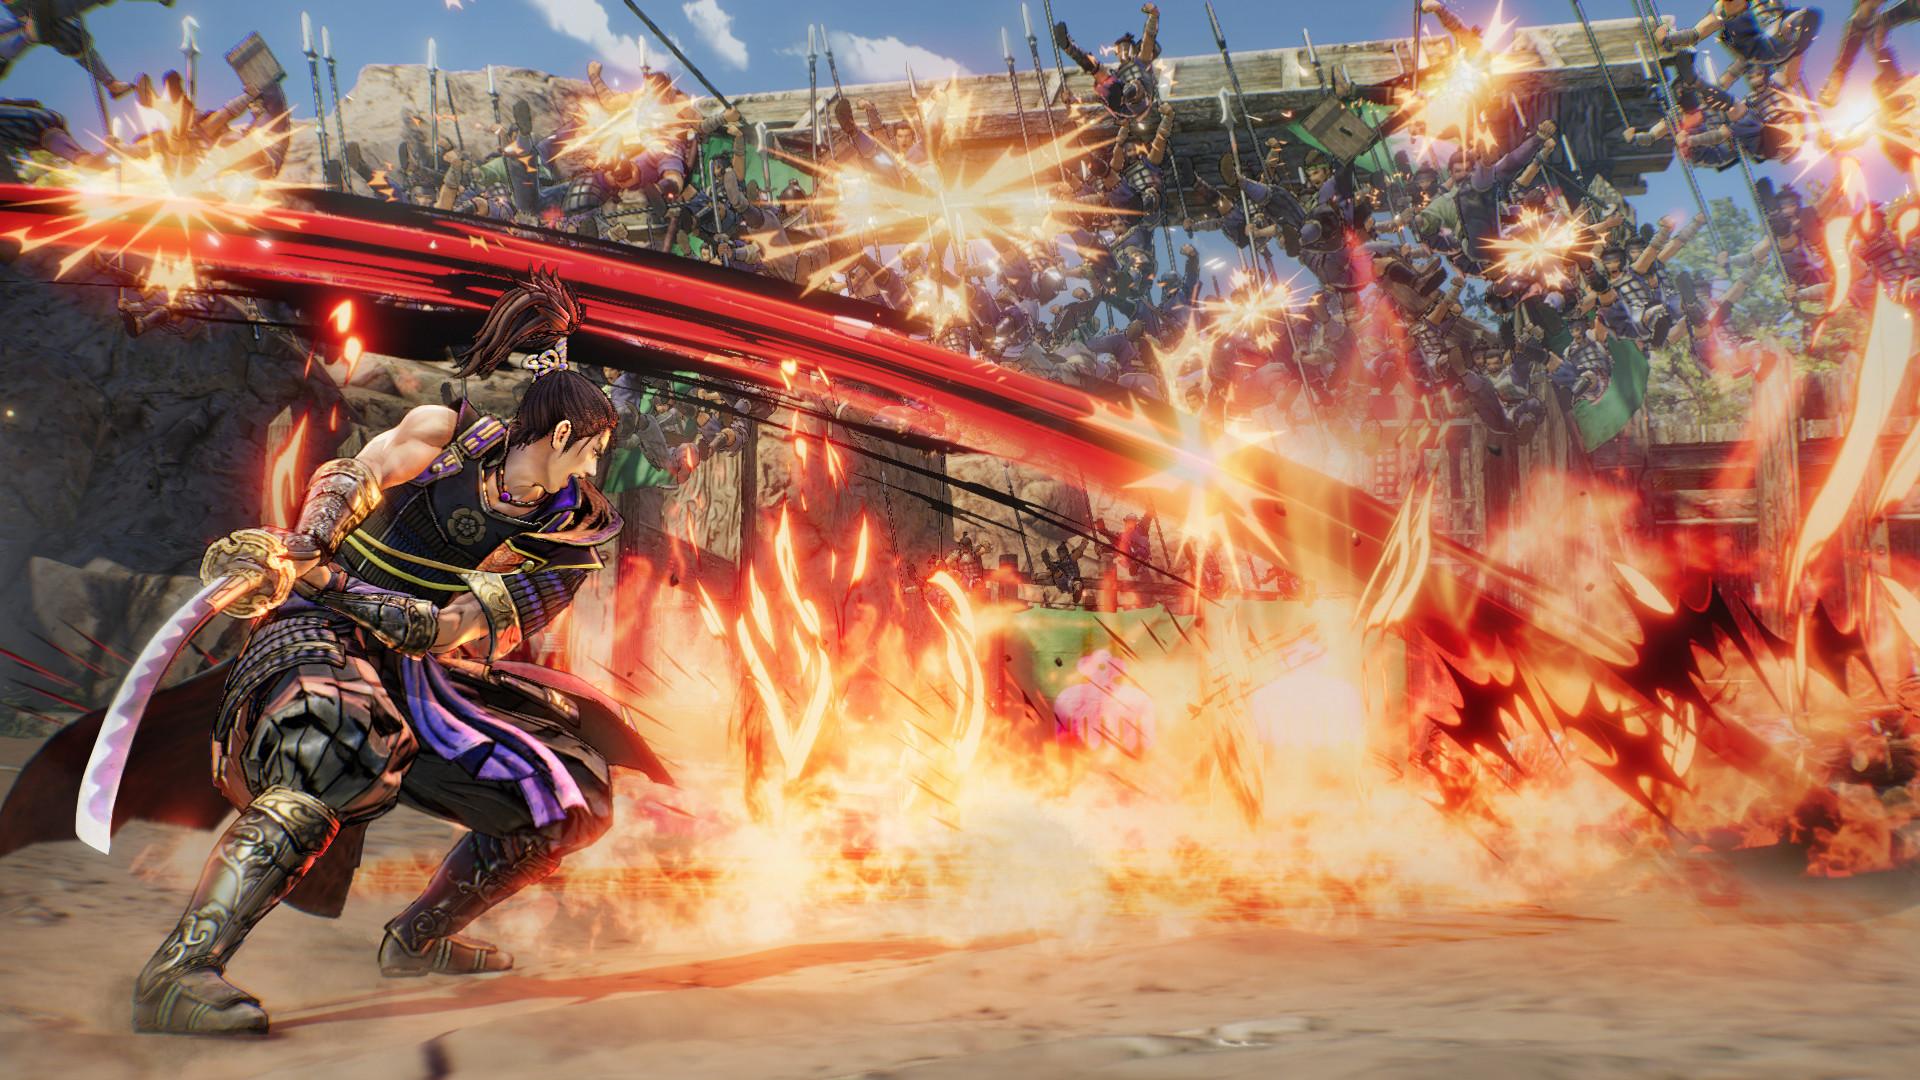 samurai-warriors-5-pc-screenshot-2